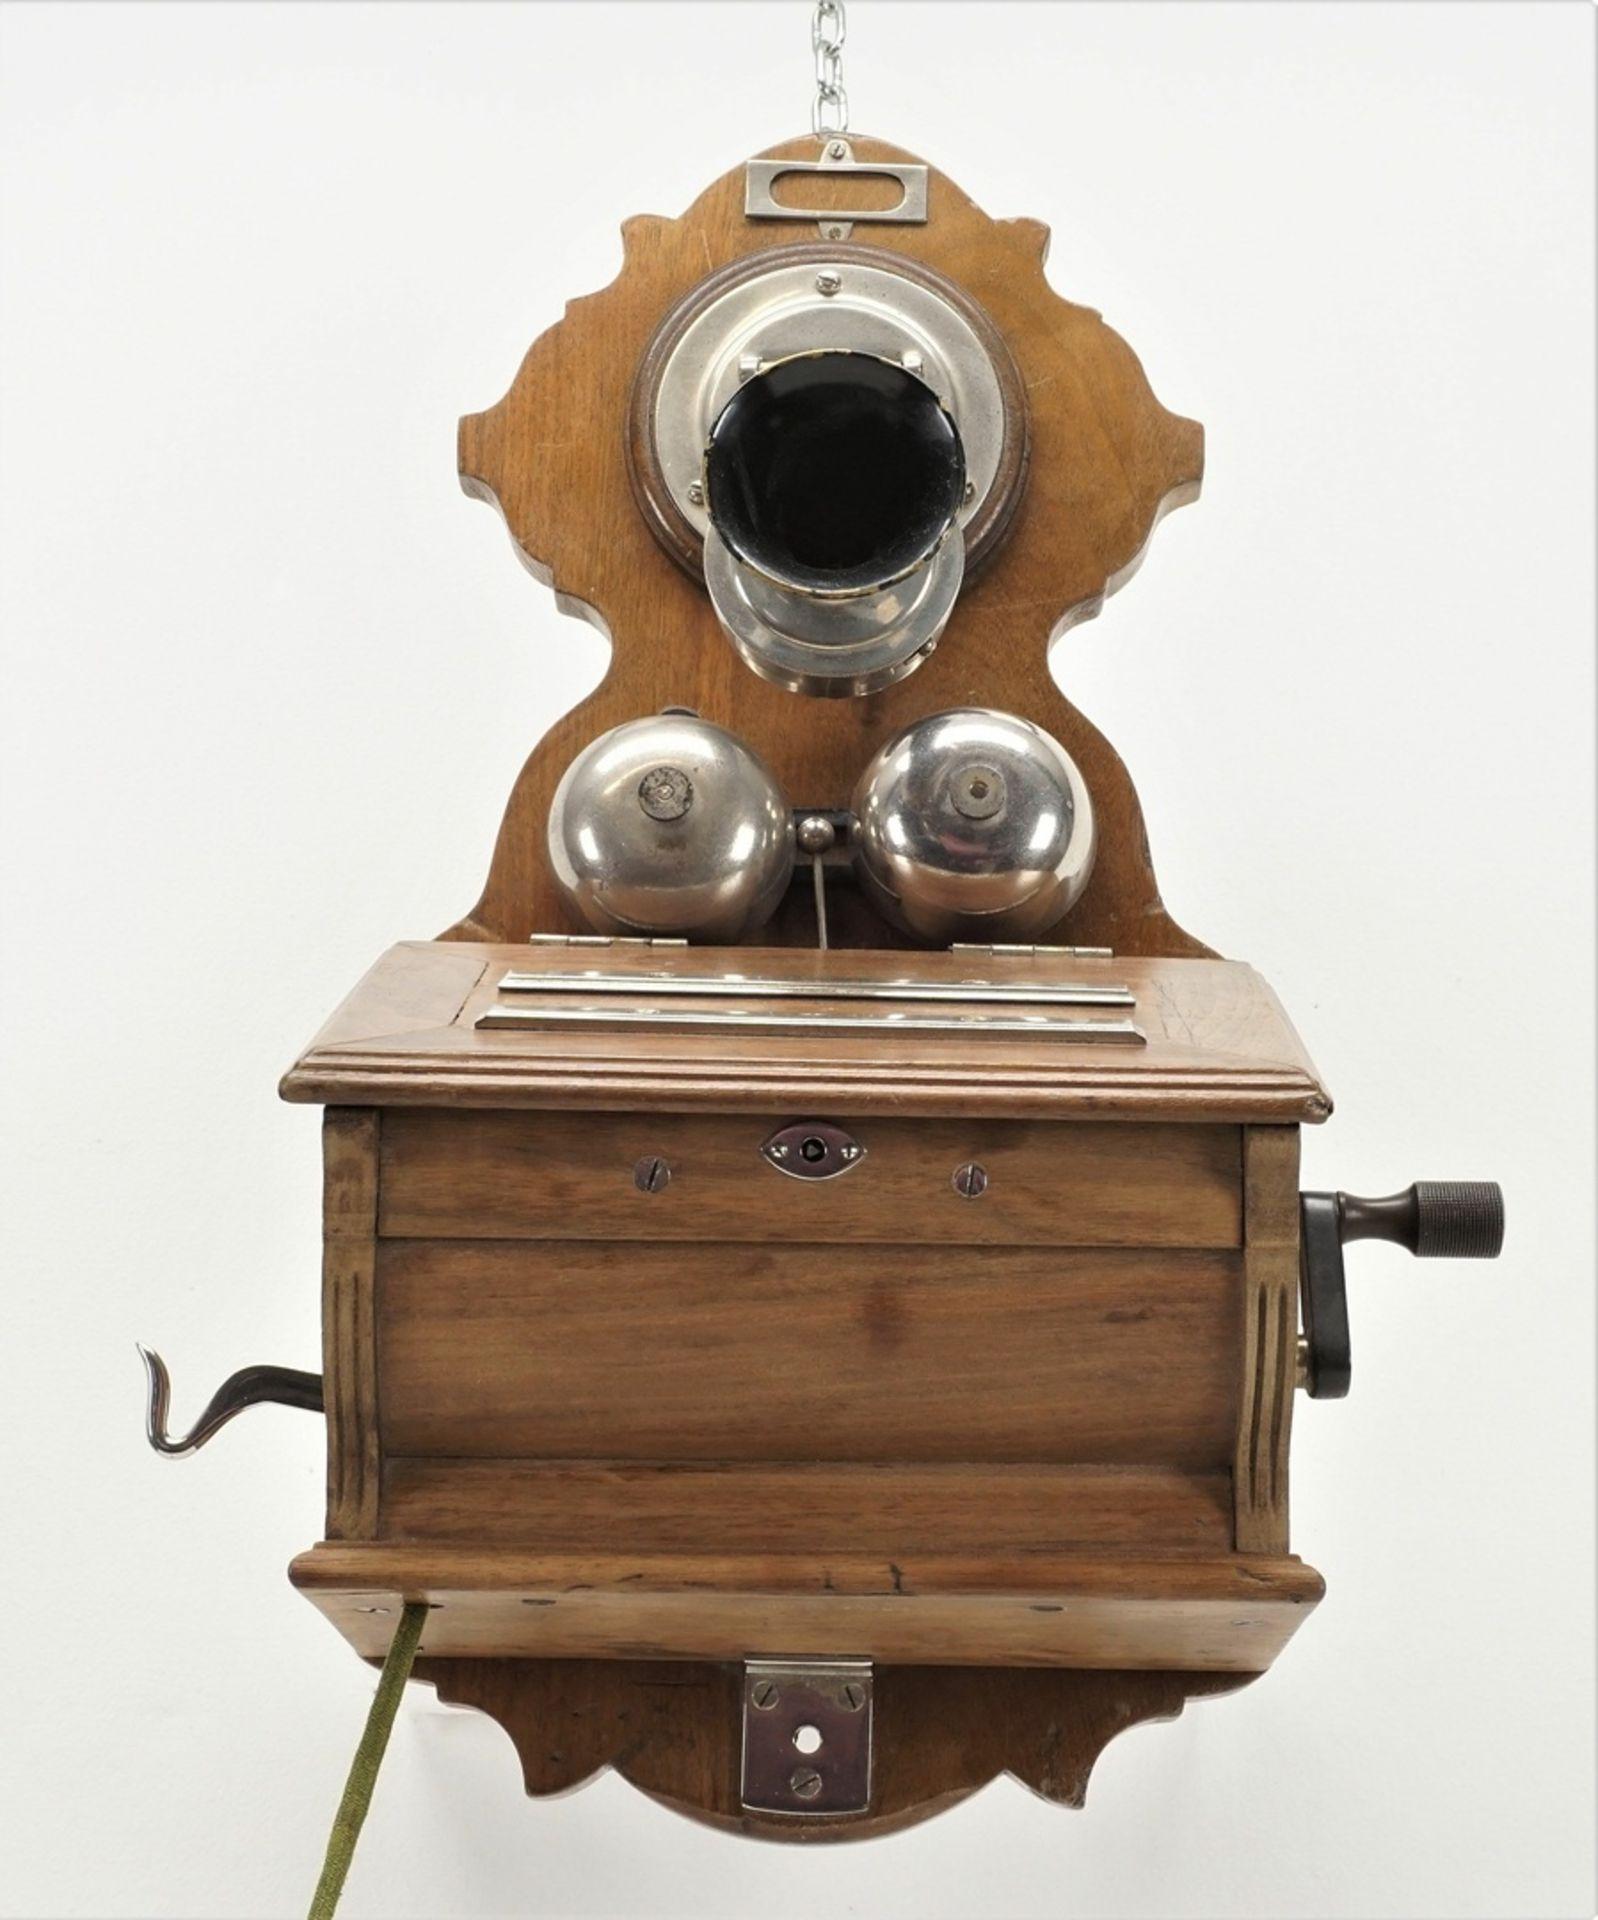 F. Schuchhardt Wandtelefon OB 04, um 1900 - Bild 3 aus 5